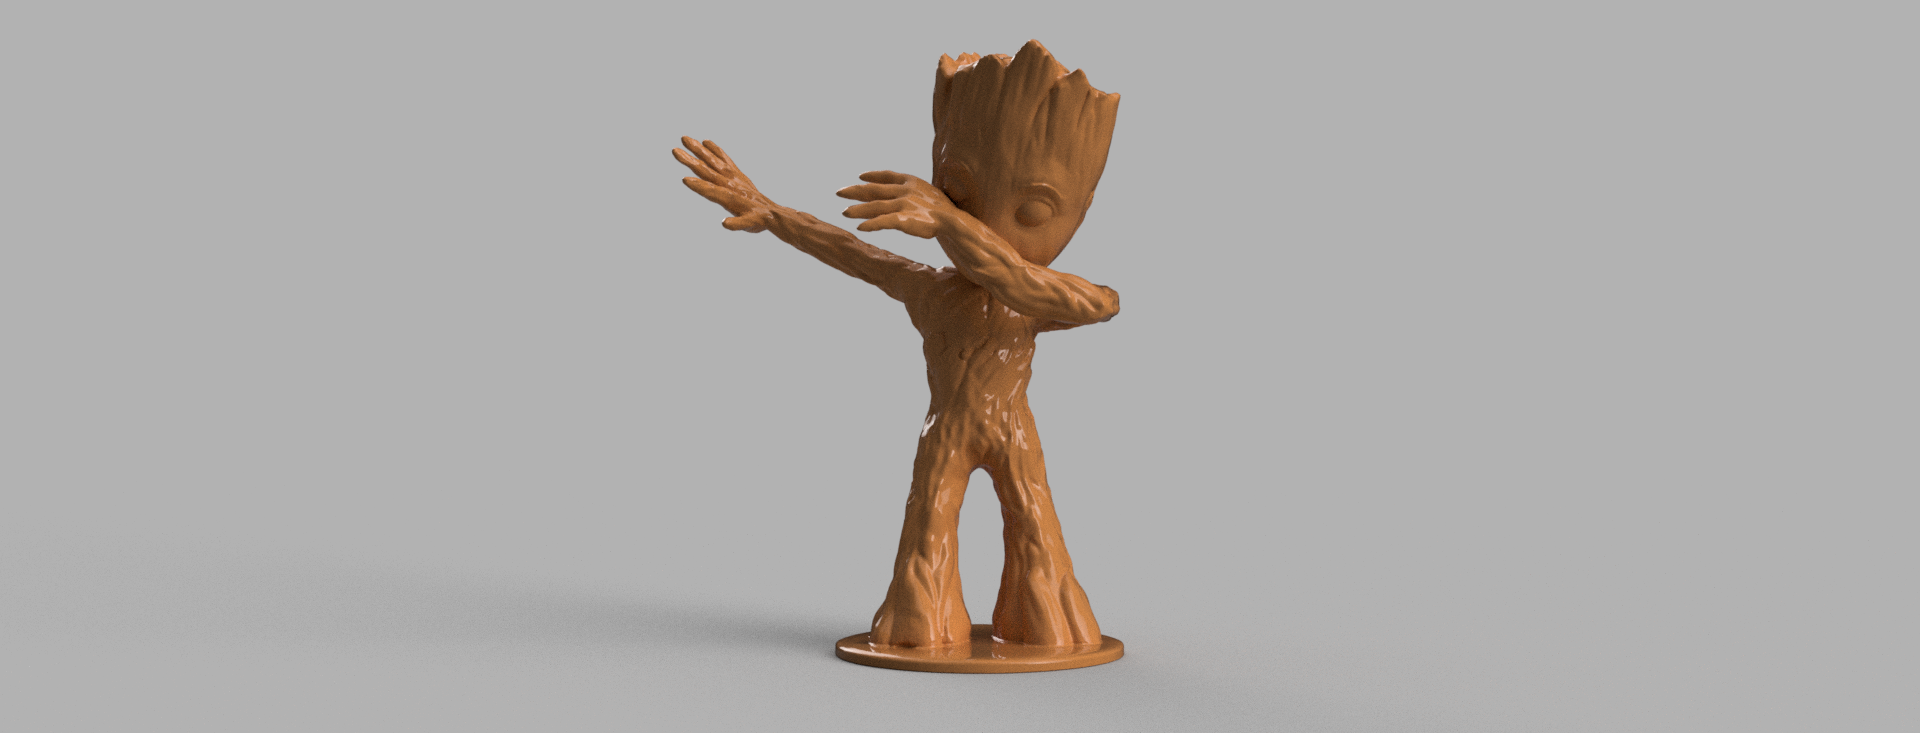 groot 1 .png Download free STL file Baby Groot Dab • 3D printing template, Motek3D